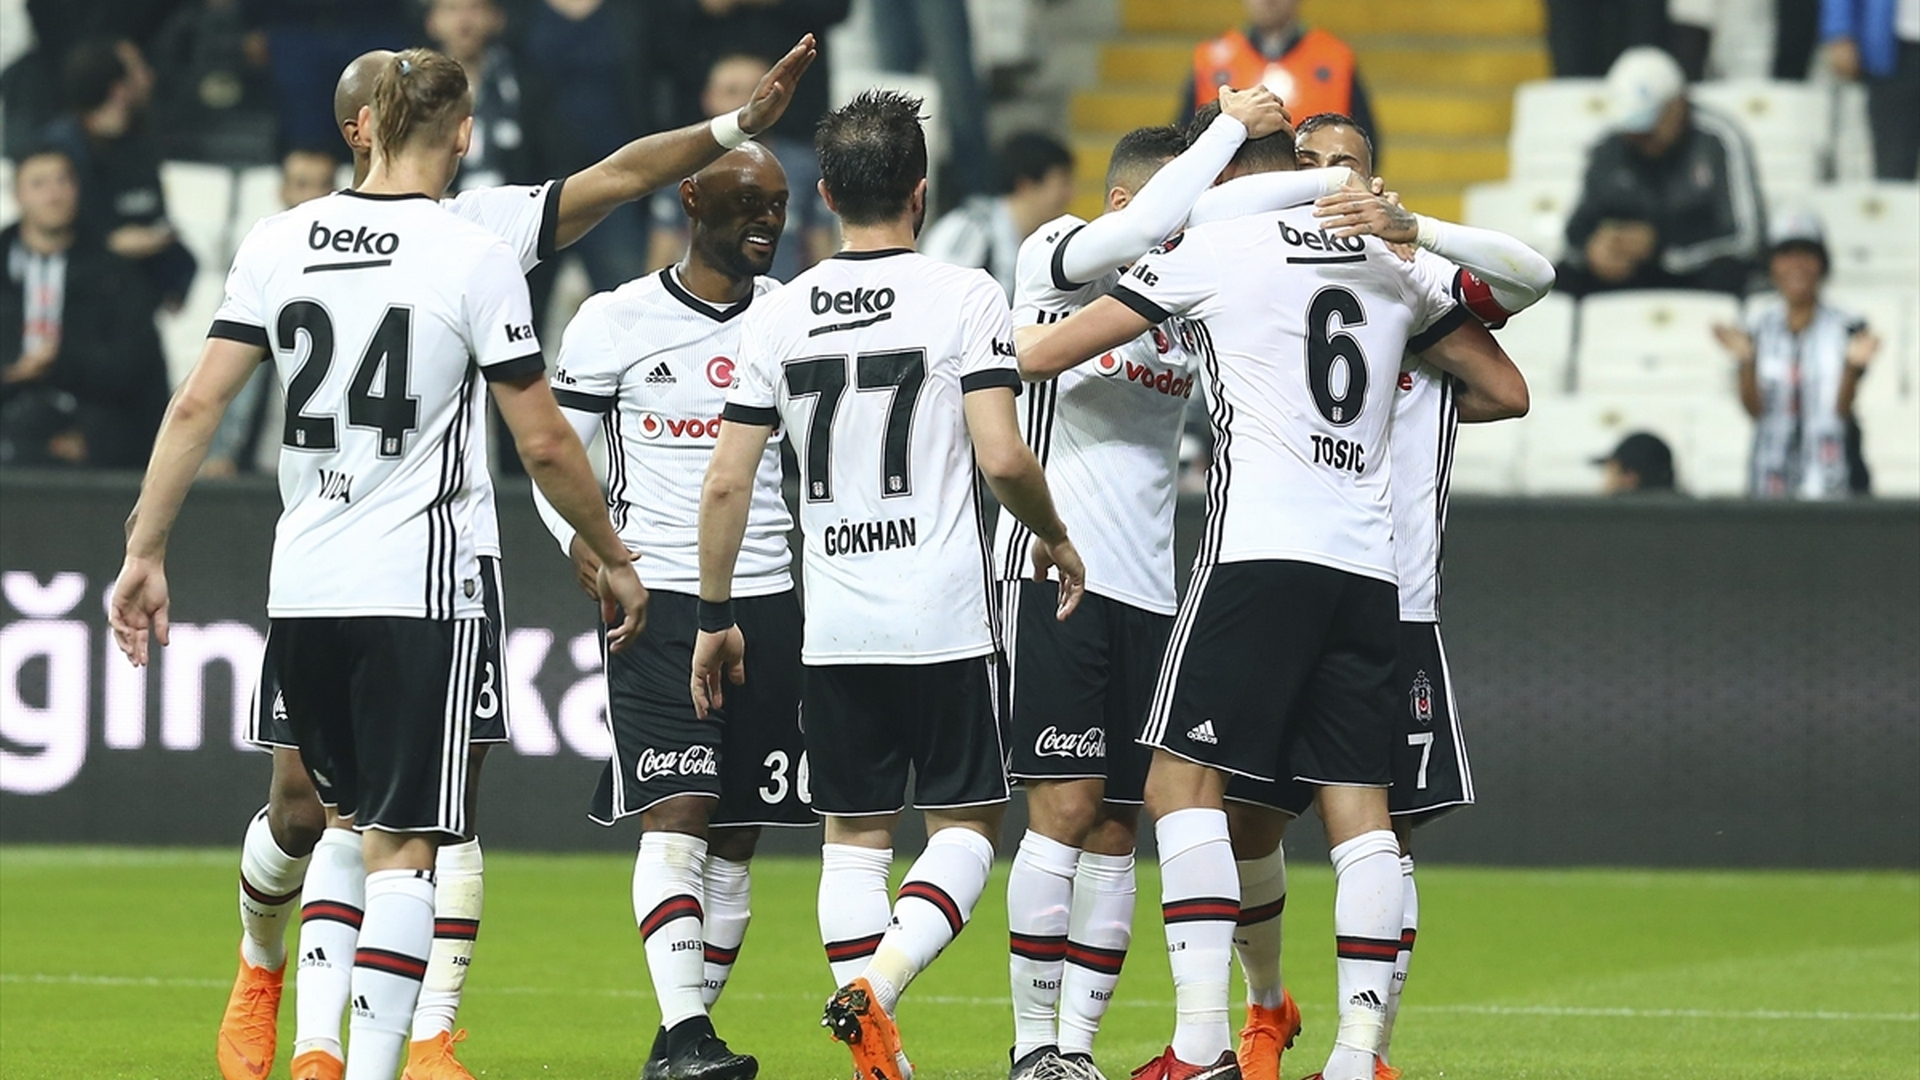 Besiktas goal celebrating 572018